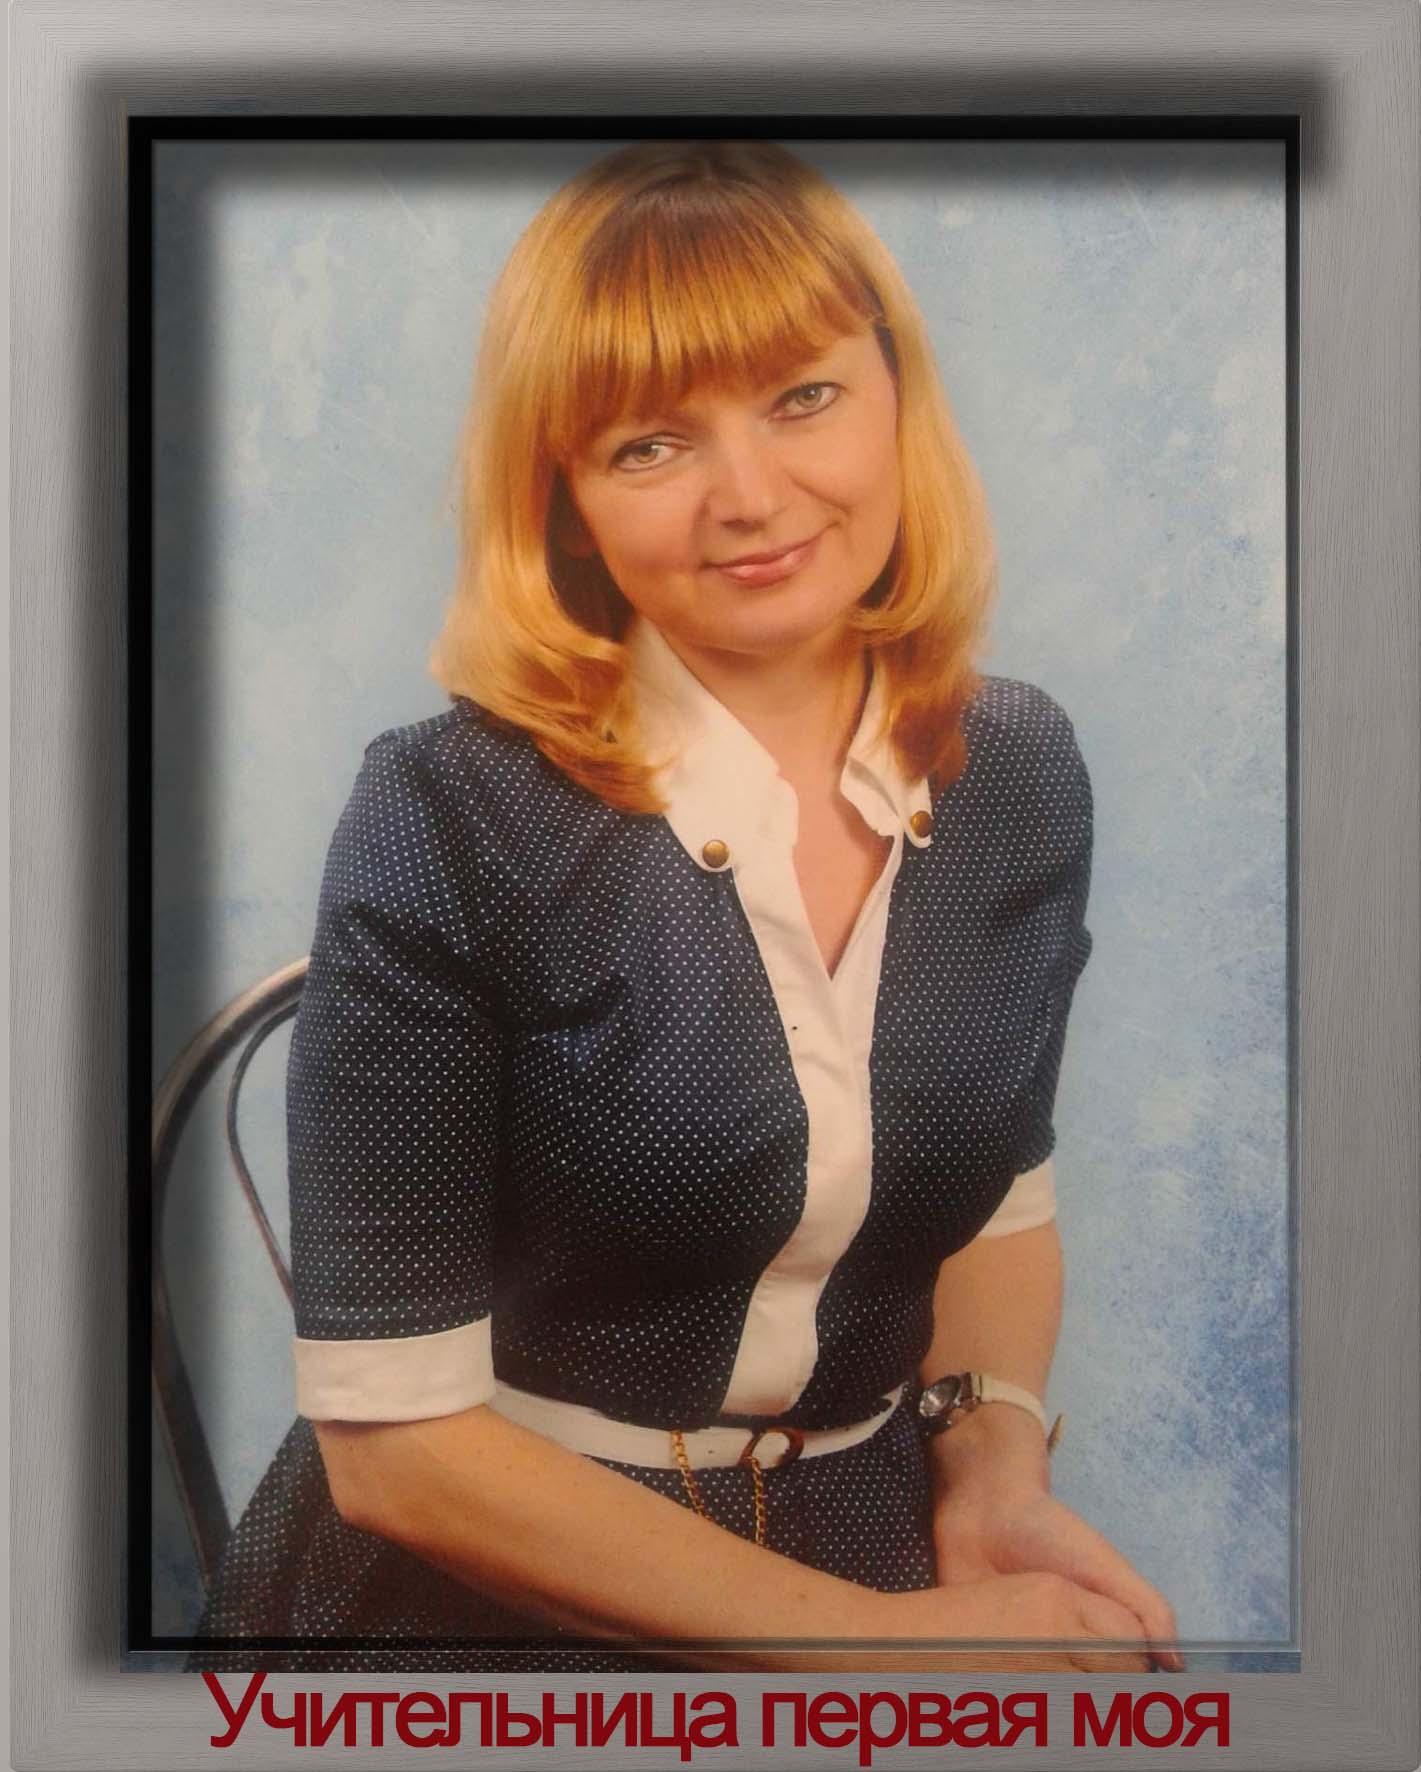 Власенкова Ирина Аркадьевна